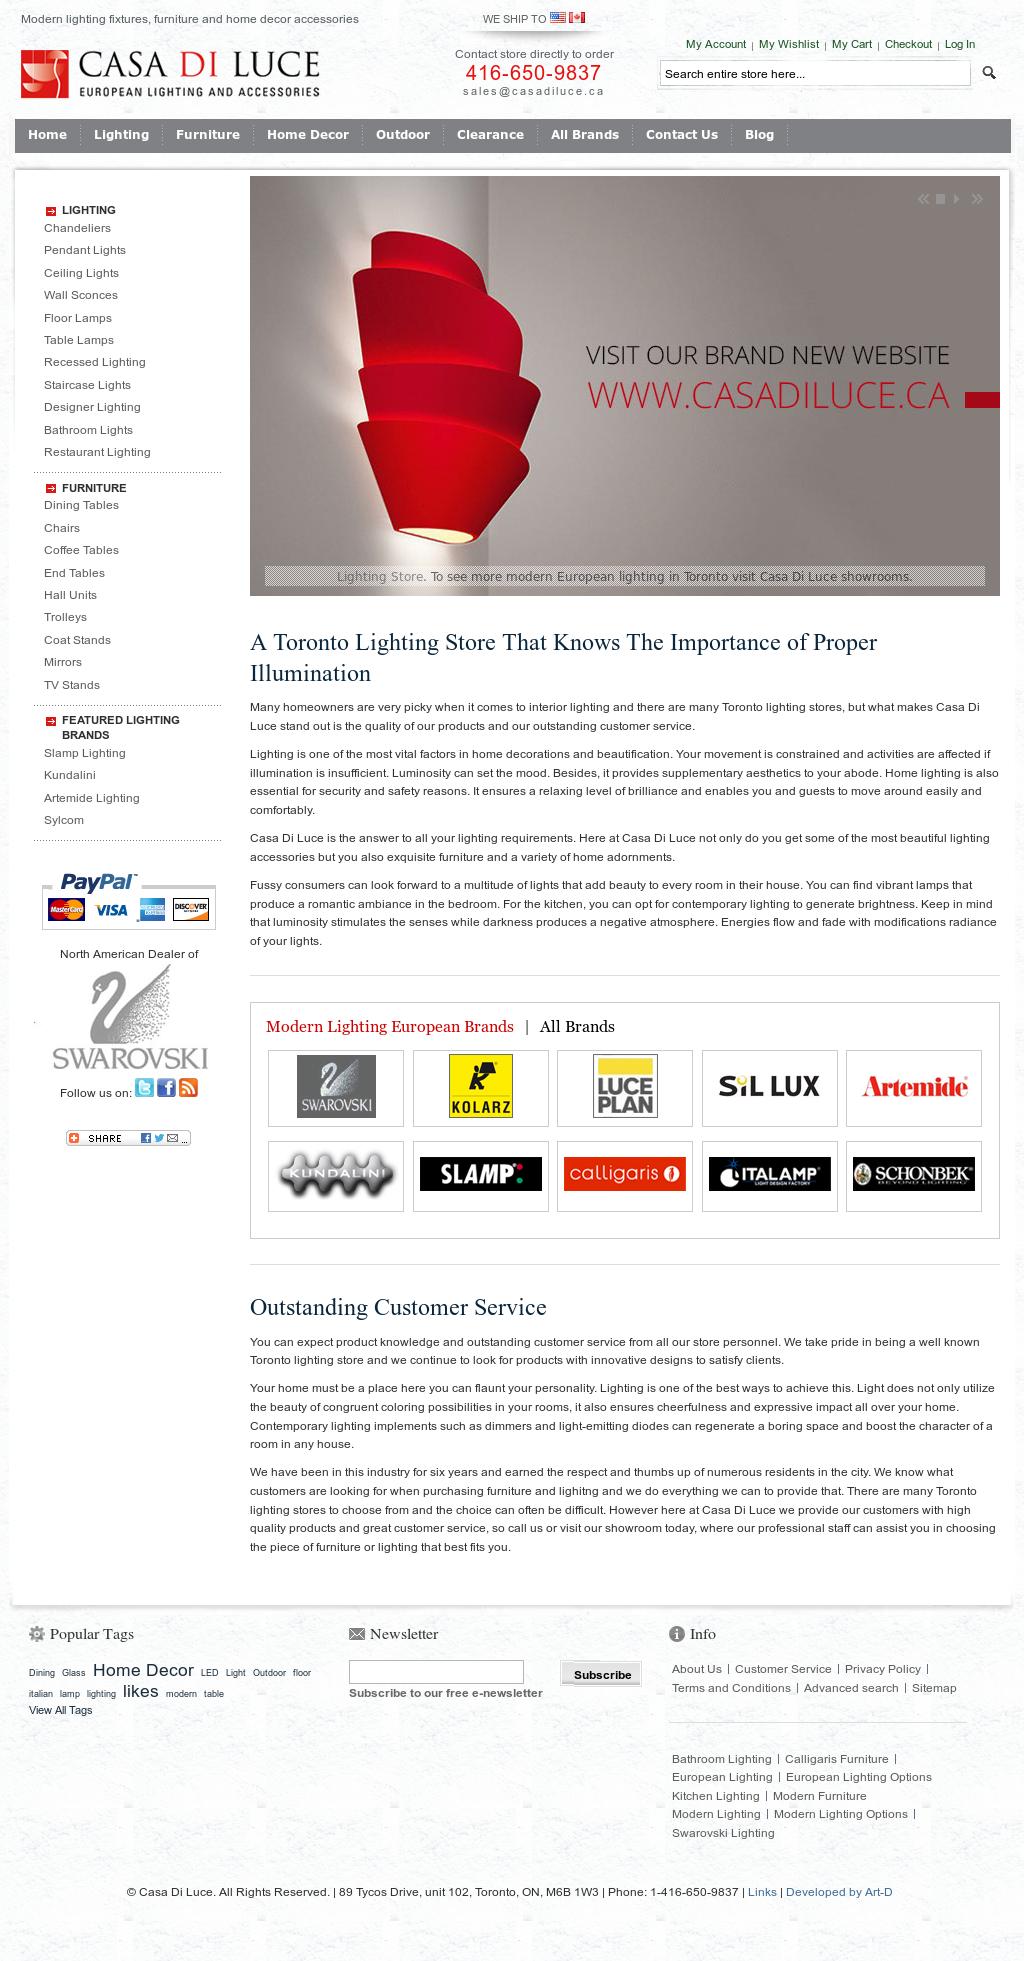 Casa Di Luce Toronto European Lighting Compeors